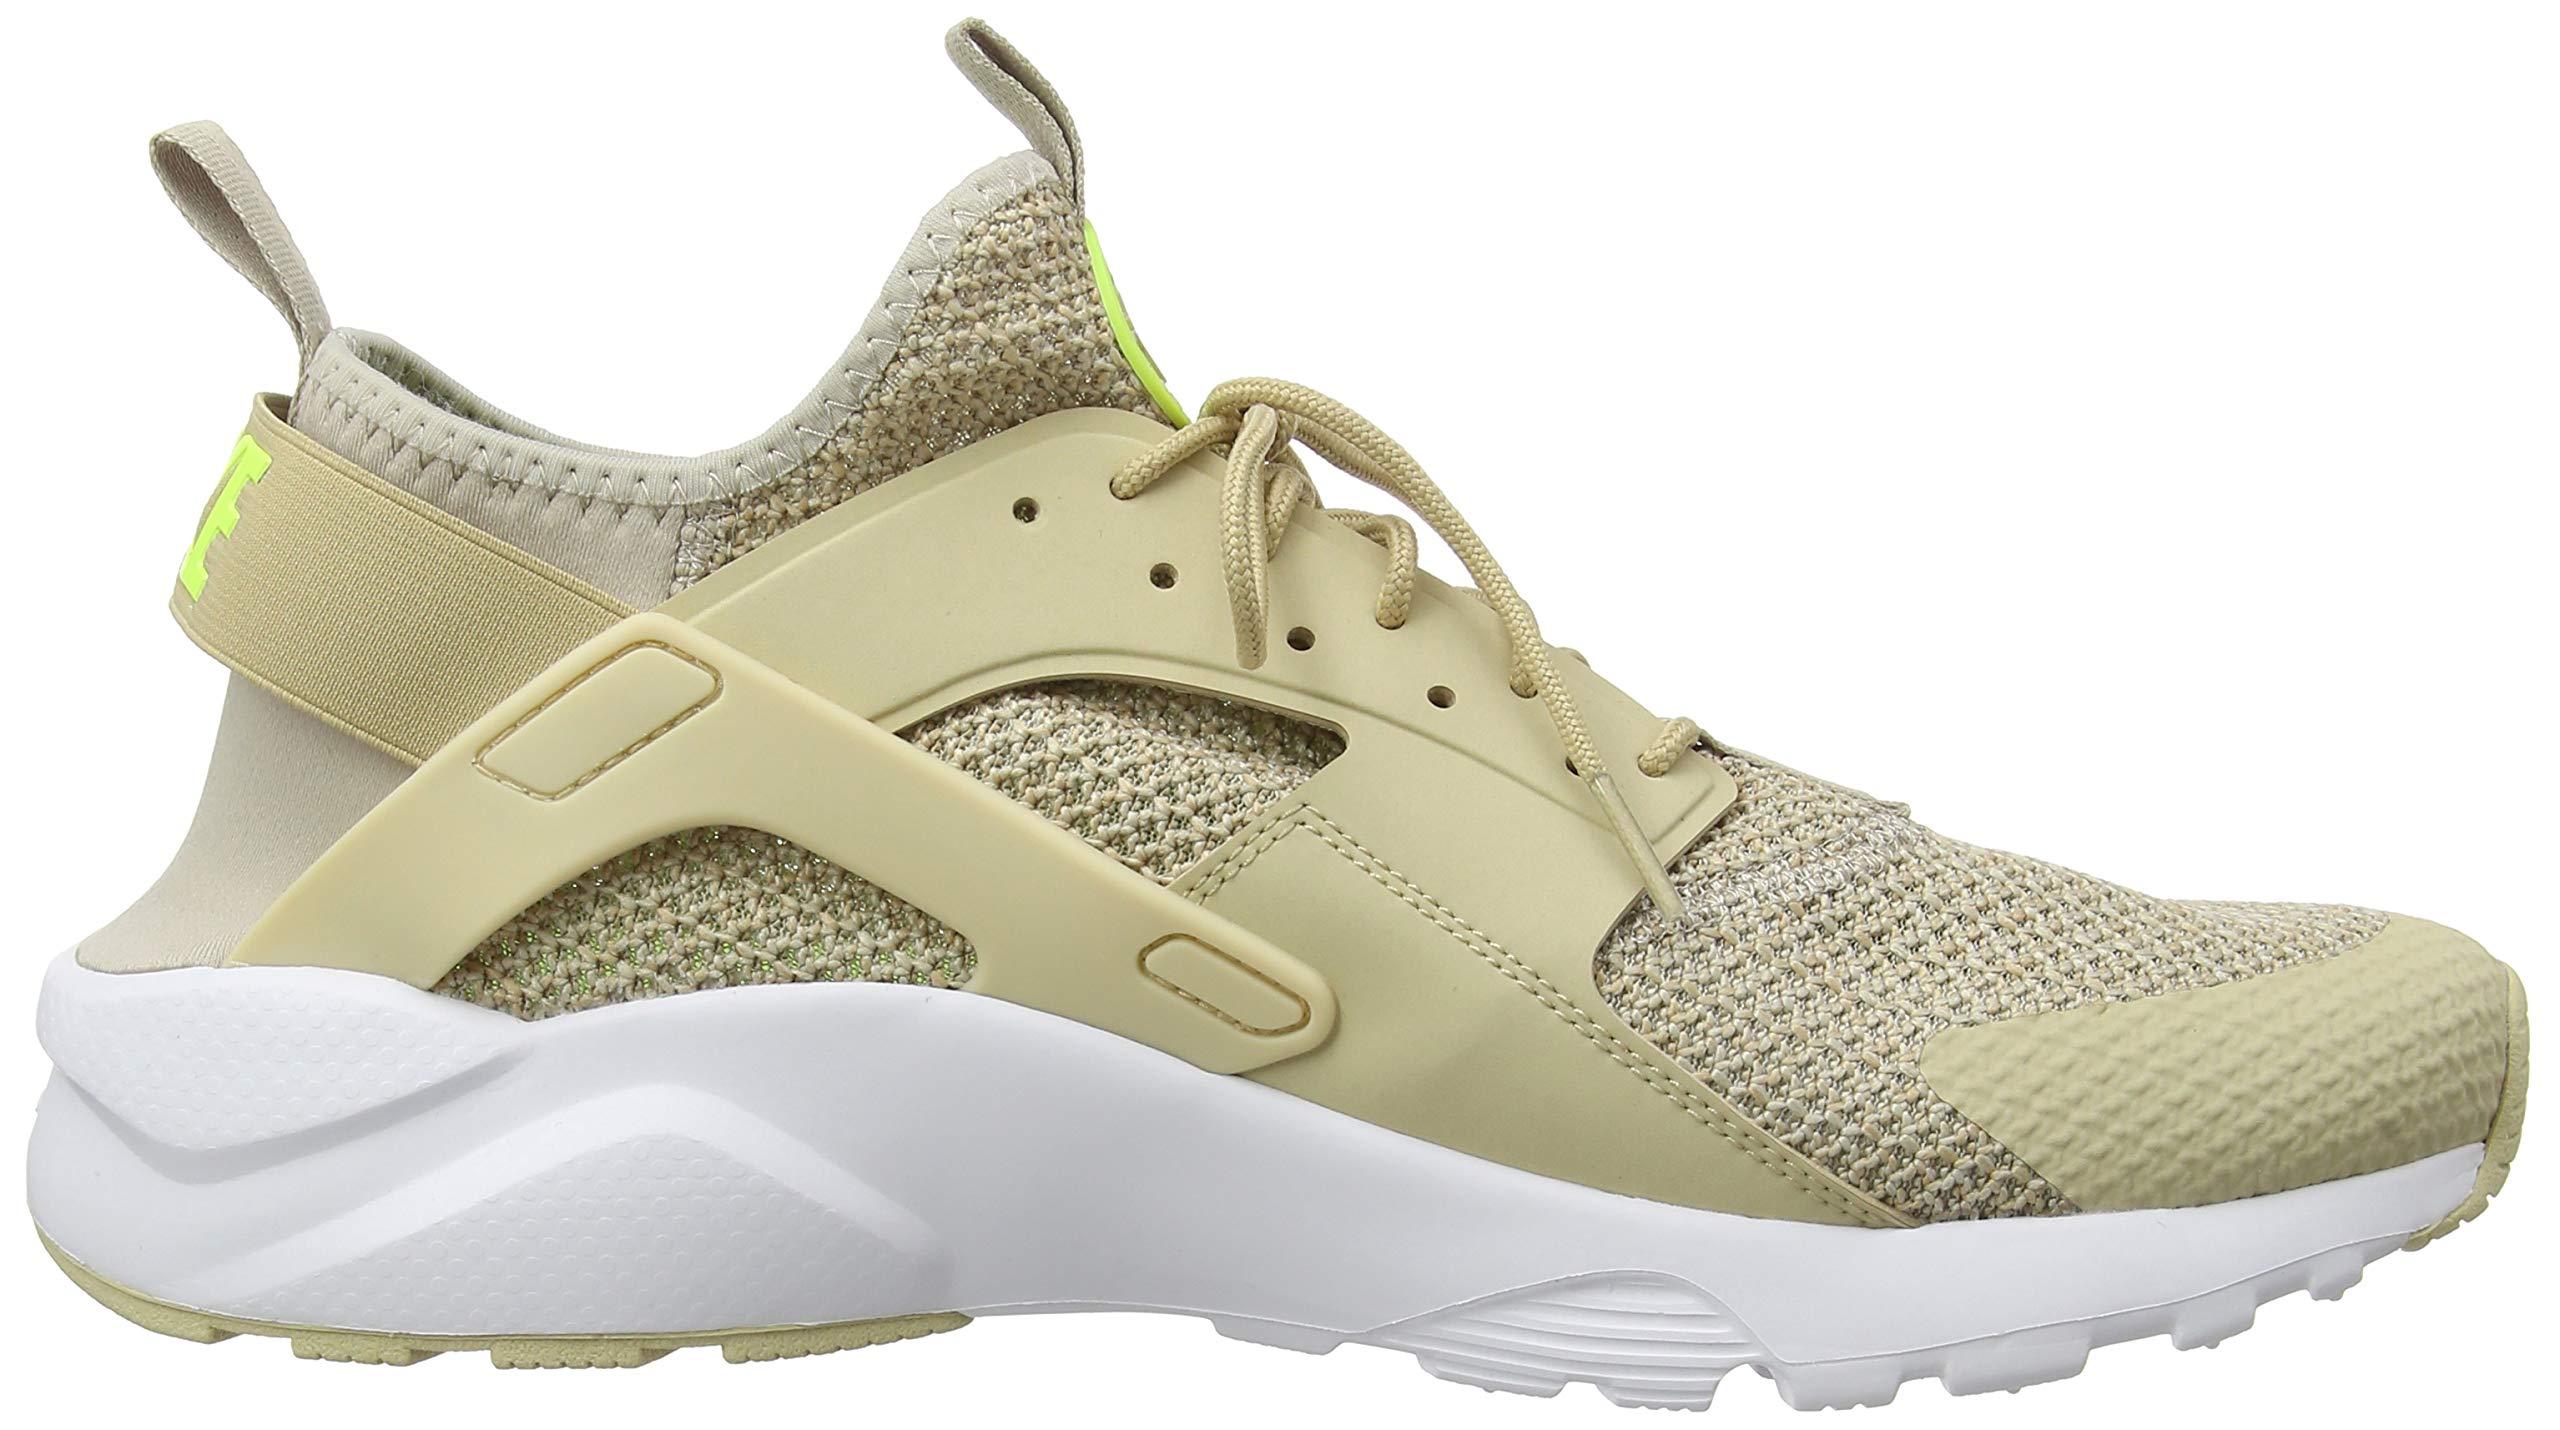 81Jm%2B7Q2KqL - Nike Men's Air Huarache Run Ultra Se Gymnastics Shoes